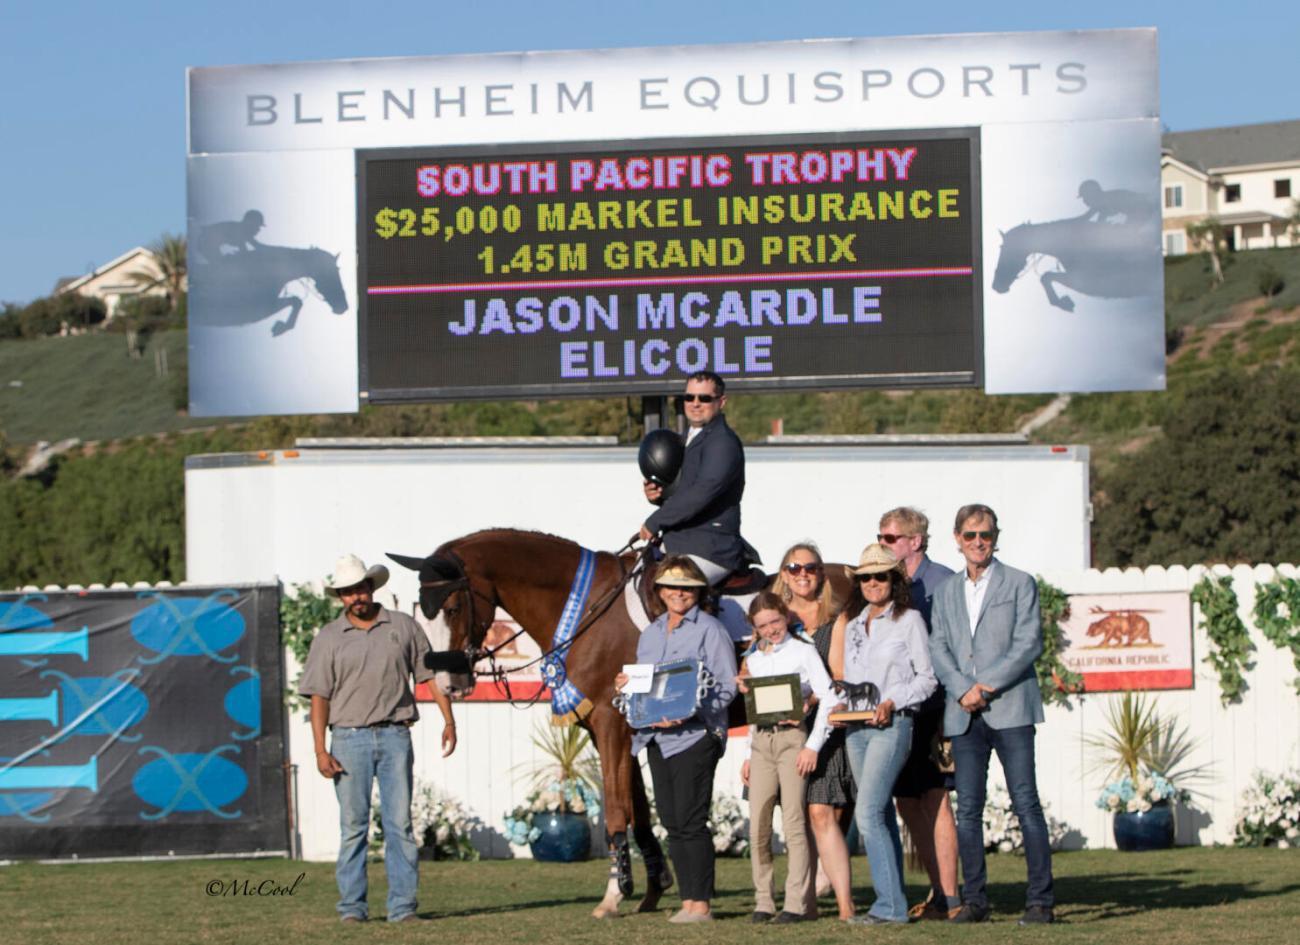 2019.09.17.99.99 Showpark CSN GP Cel Jason McArdle & Elicole McCool Ph